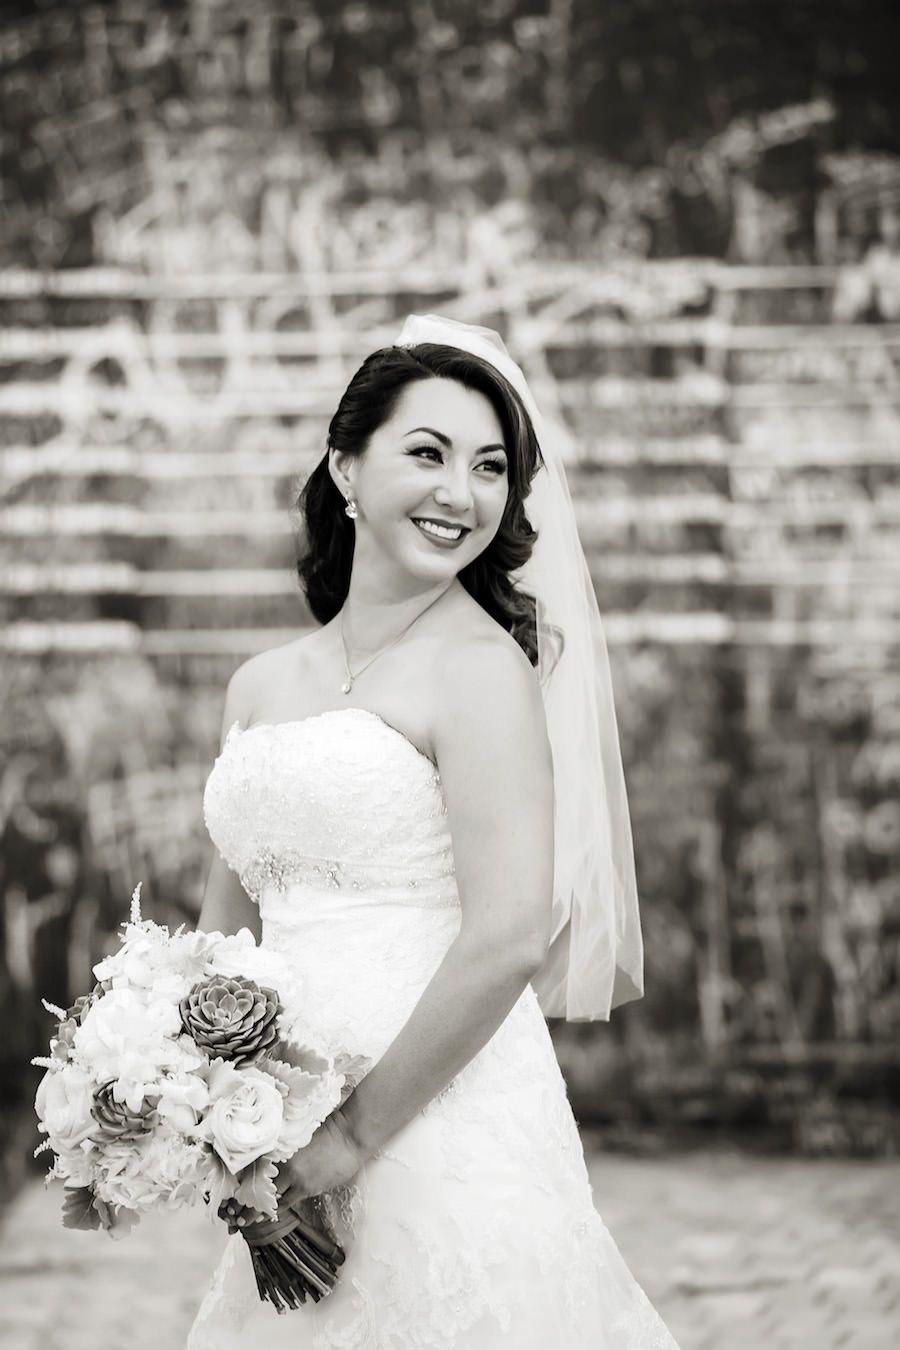 Outdoor, Bridal Wedding Portrait in Strapless David Tutera Wedding Dress and Veil